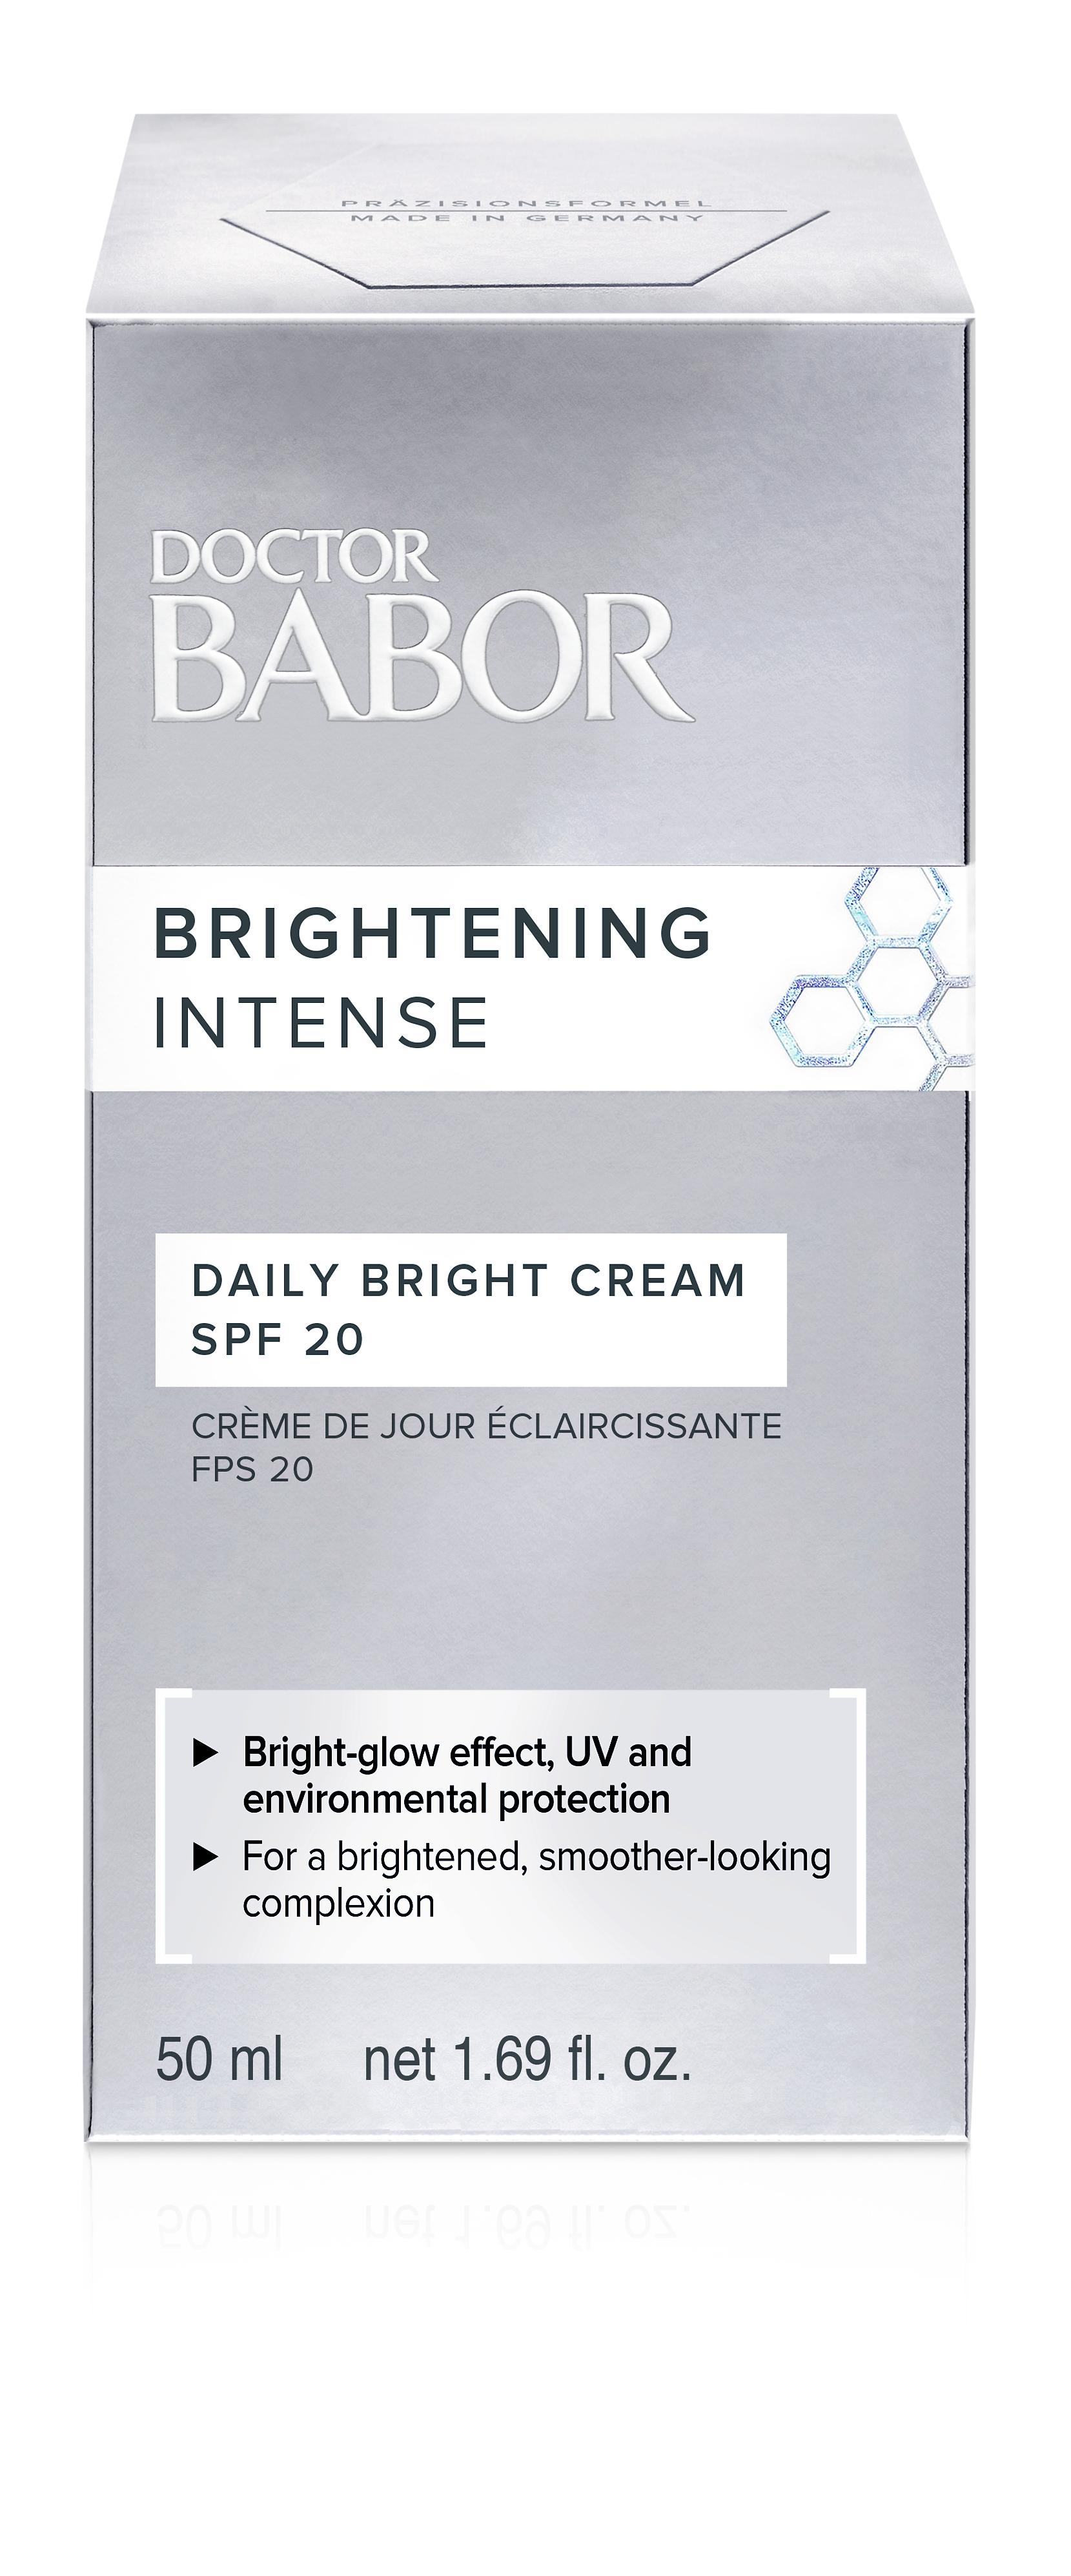 DOCTOR BABOR BRIGHTENING CELLULAR Daily Bright Cream SPF 20